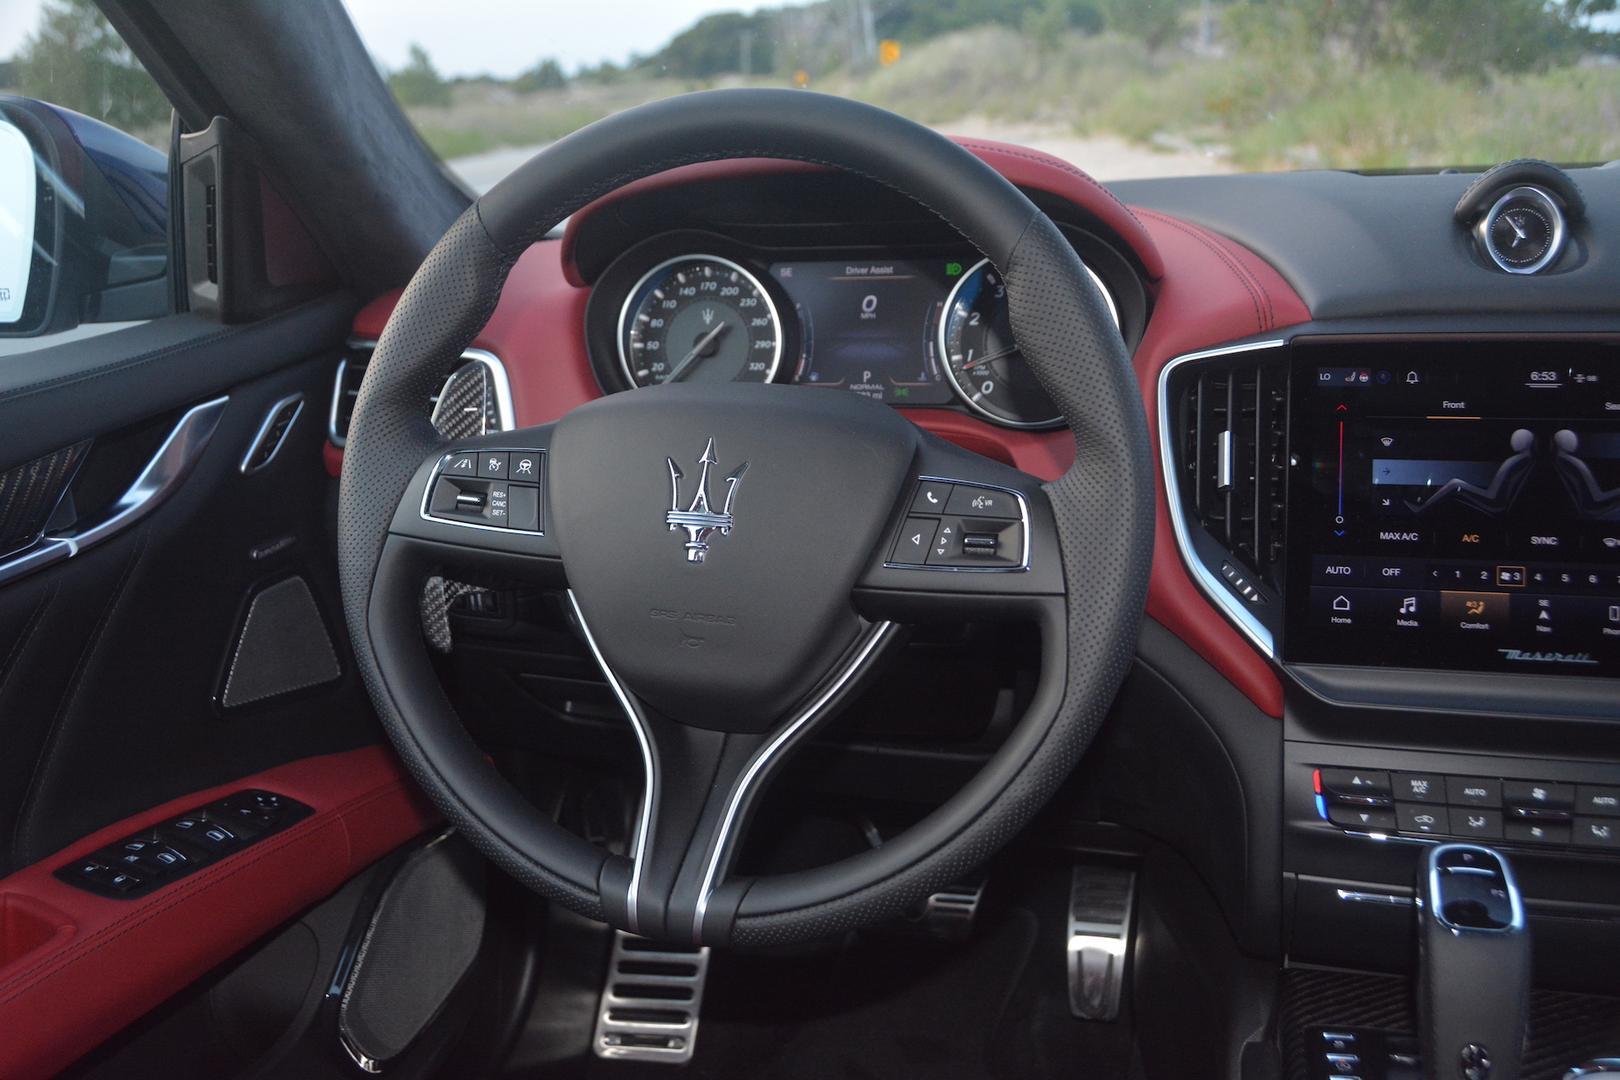 Maserati Ghibli Trofeo steering wheel